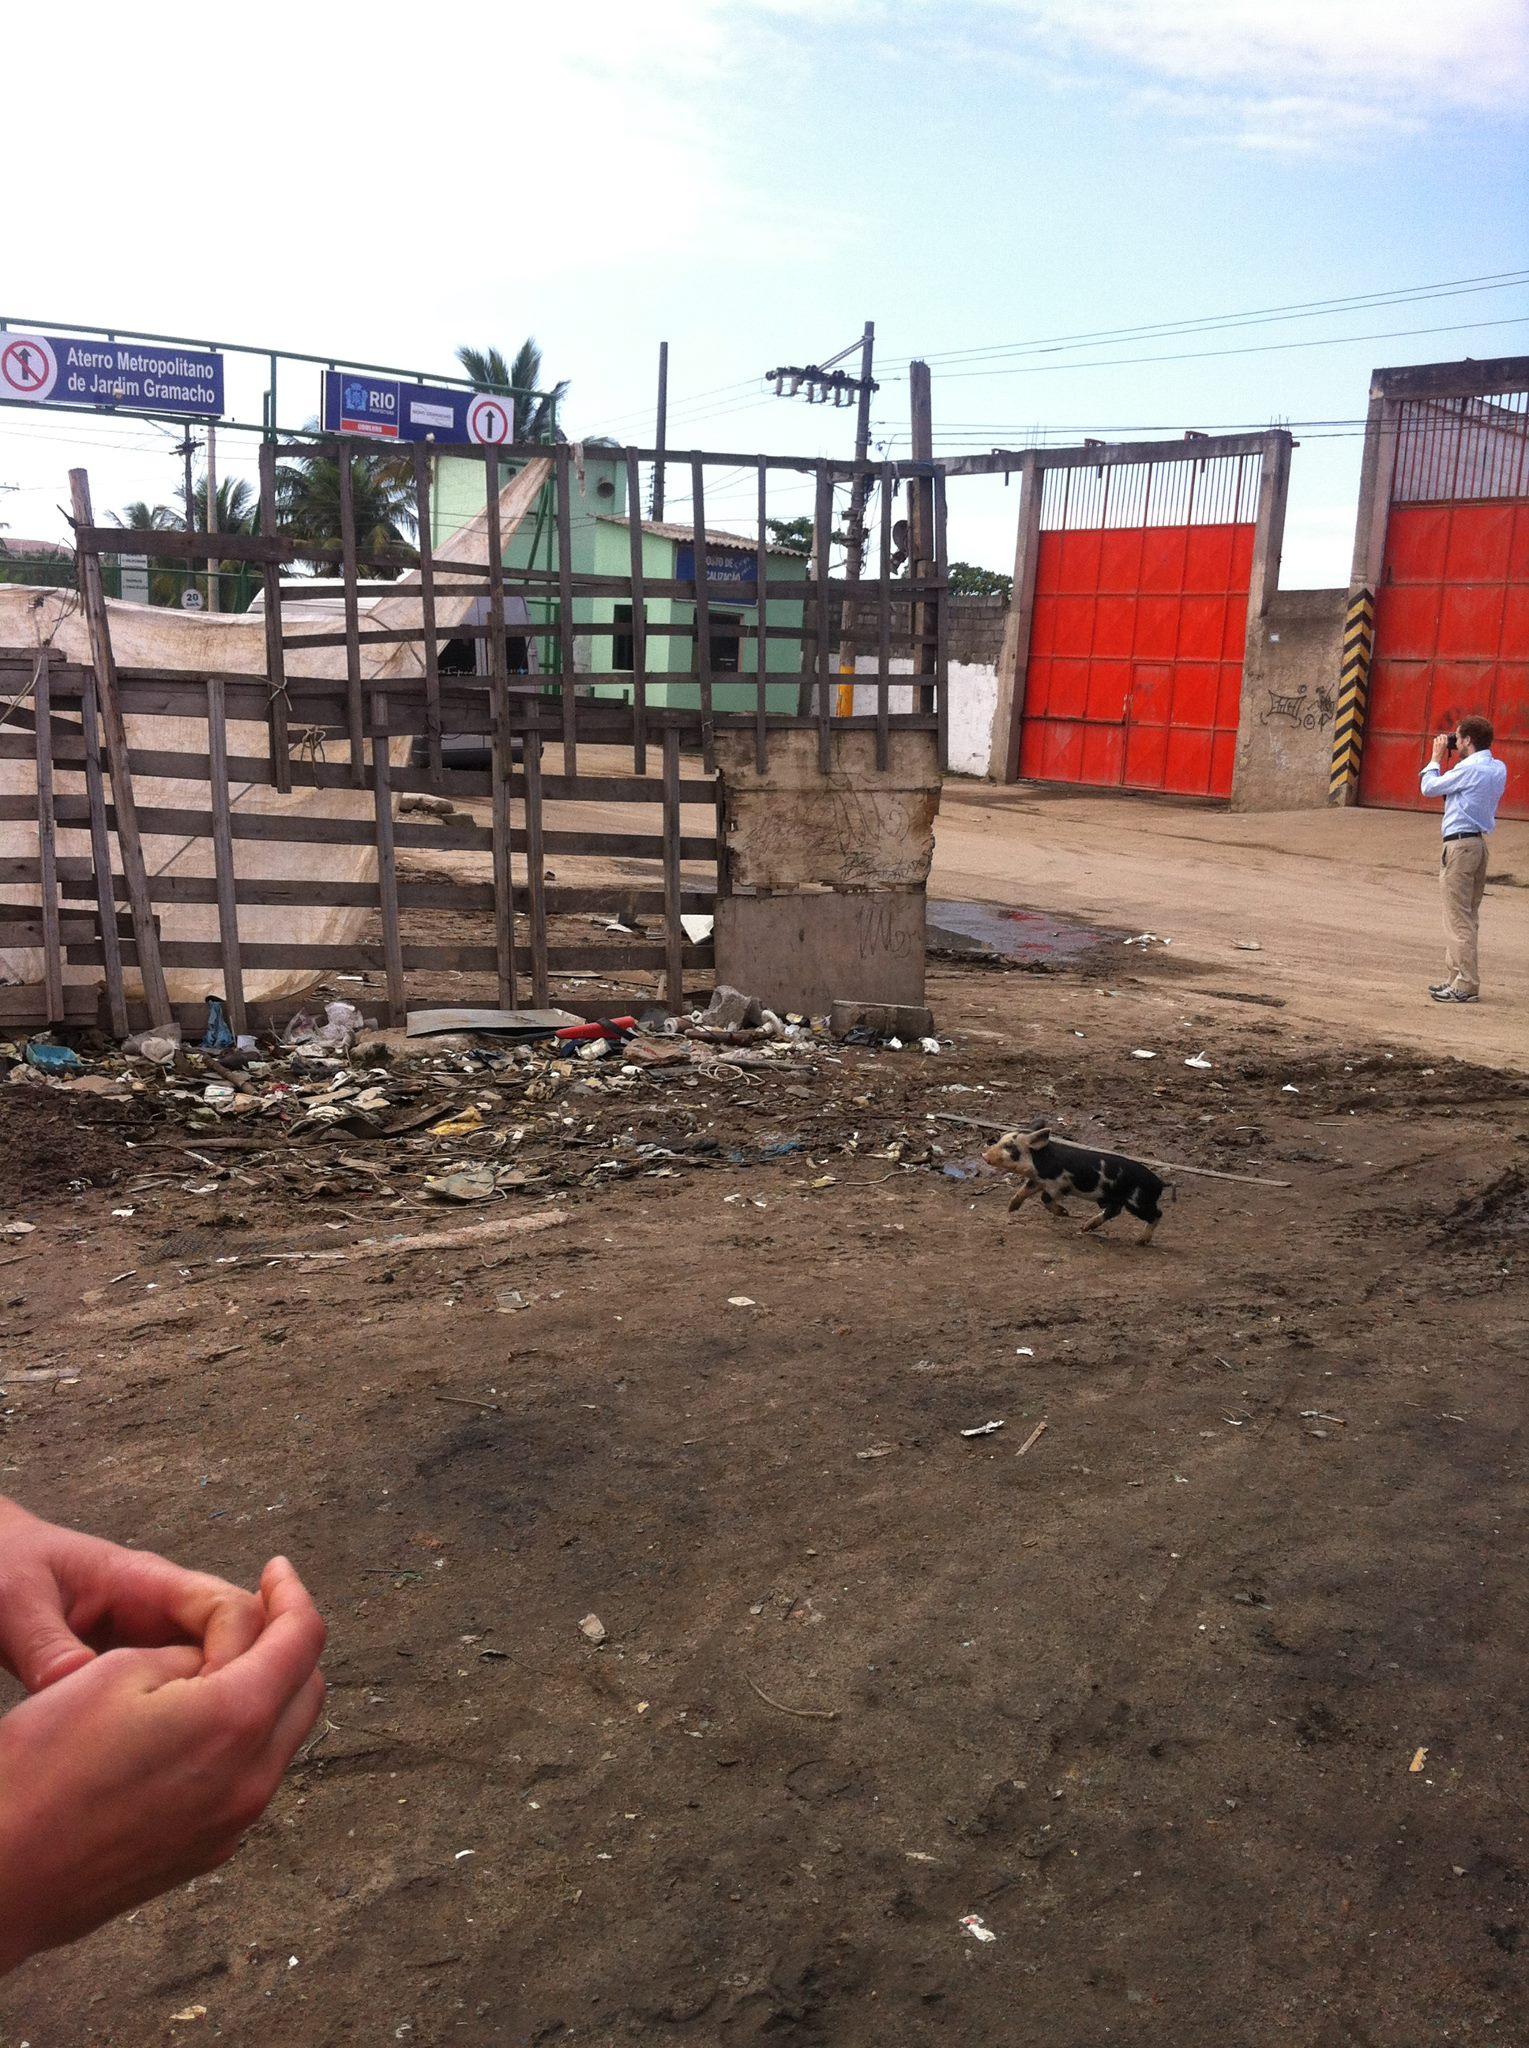 2012-06-28-PigletofJardimGramacho.jpg